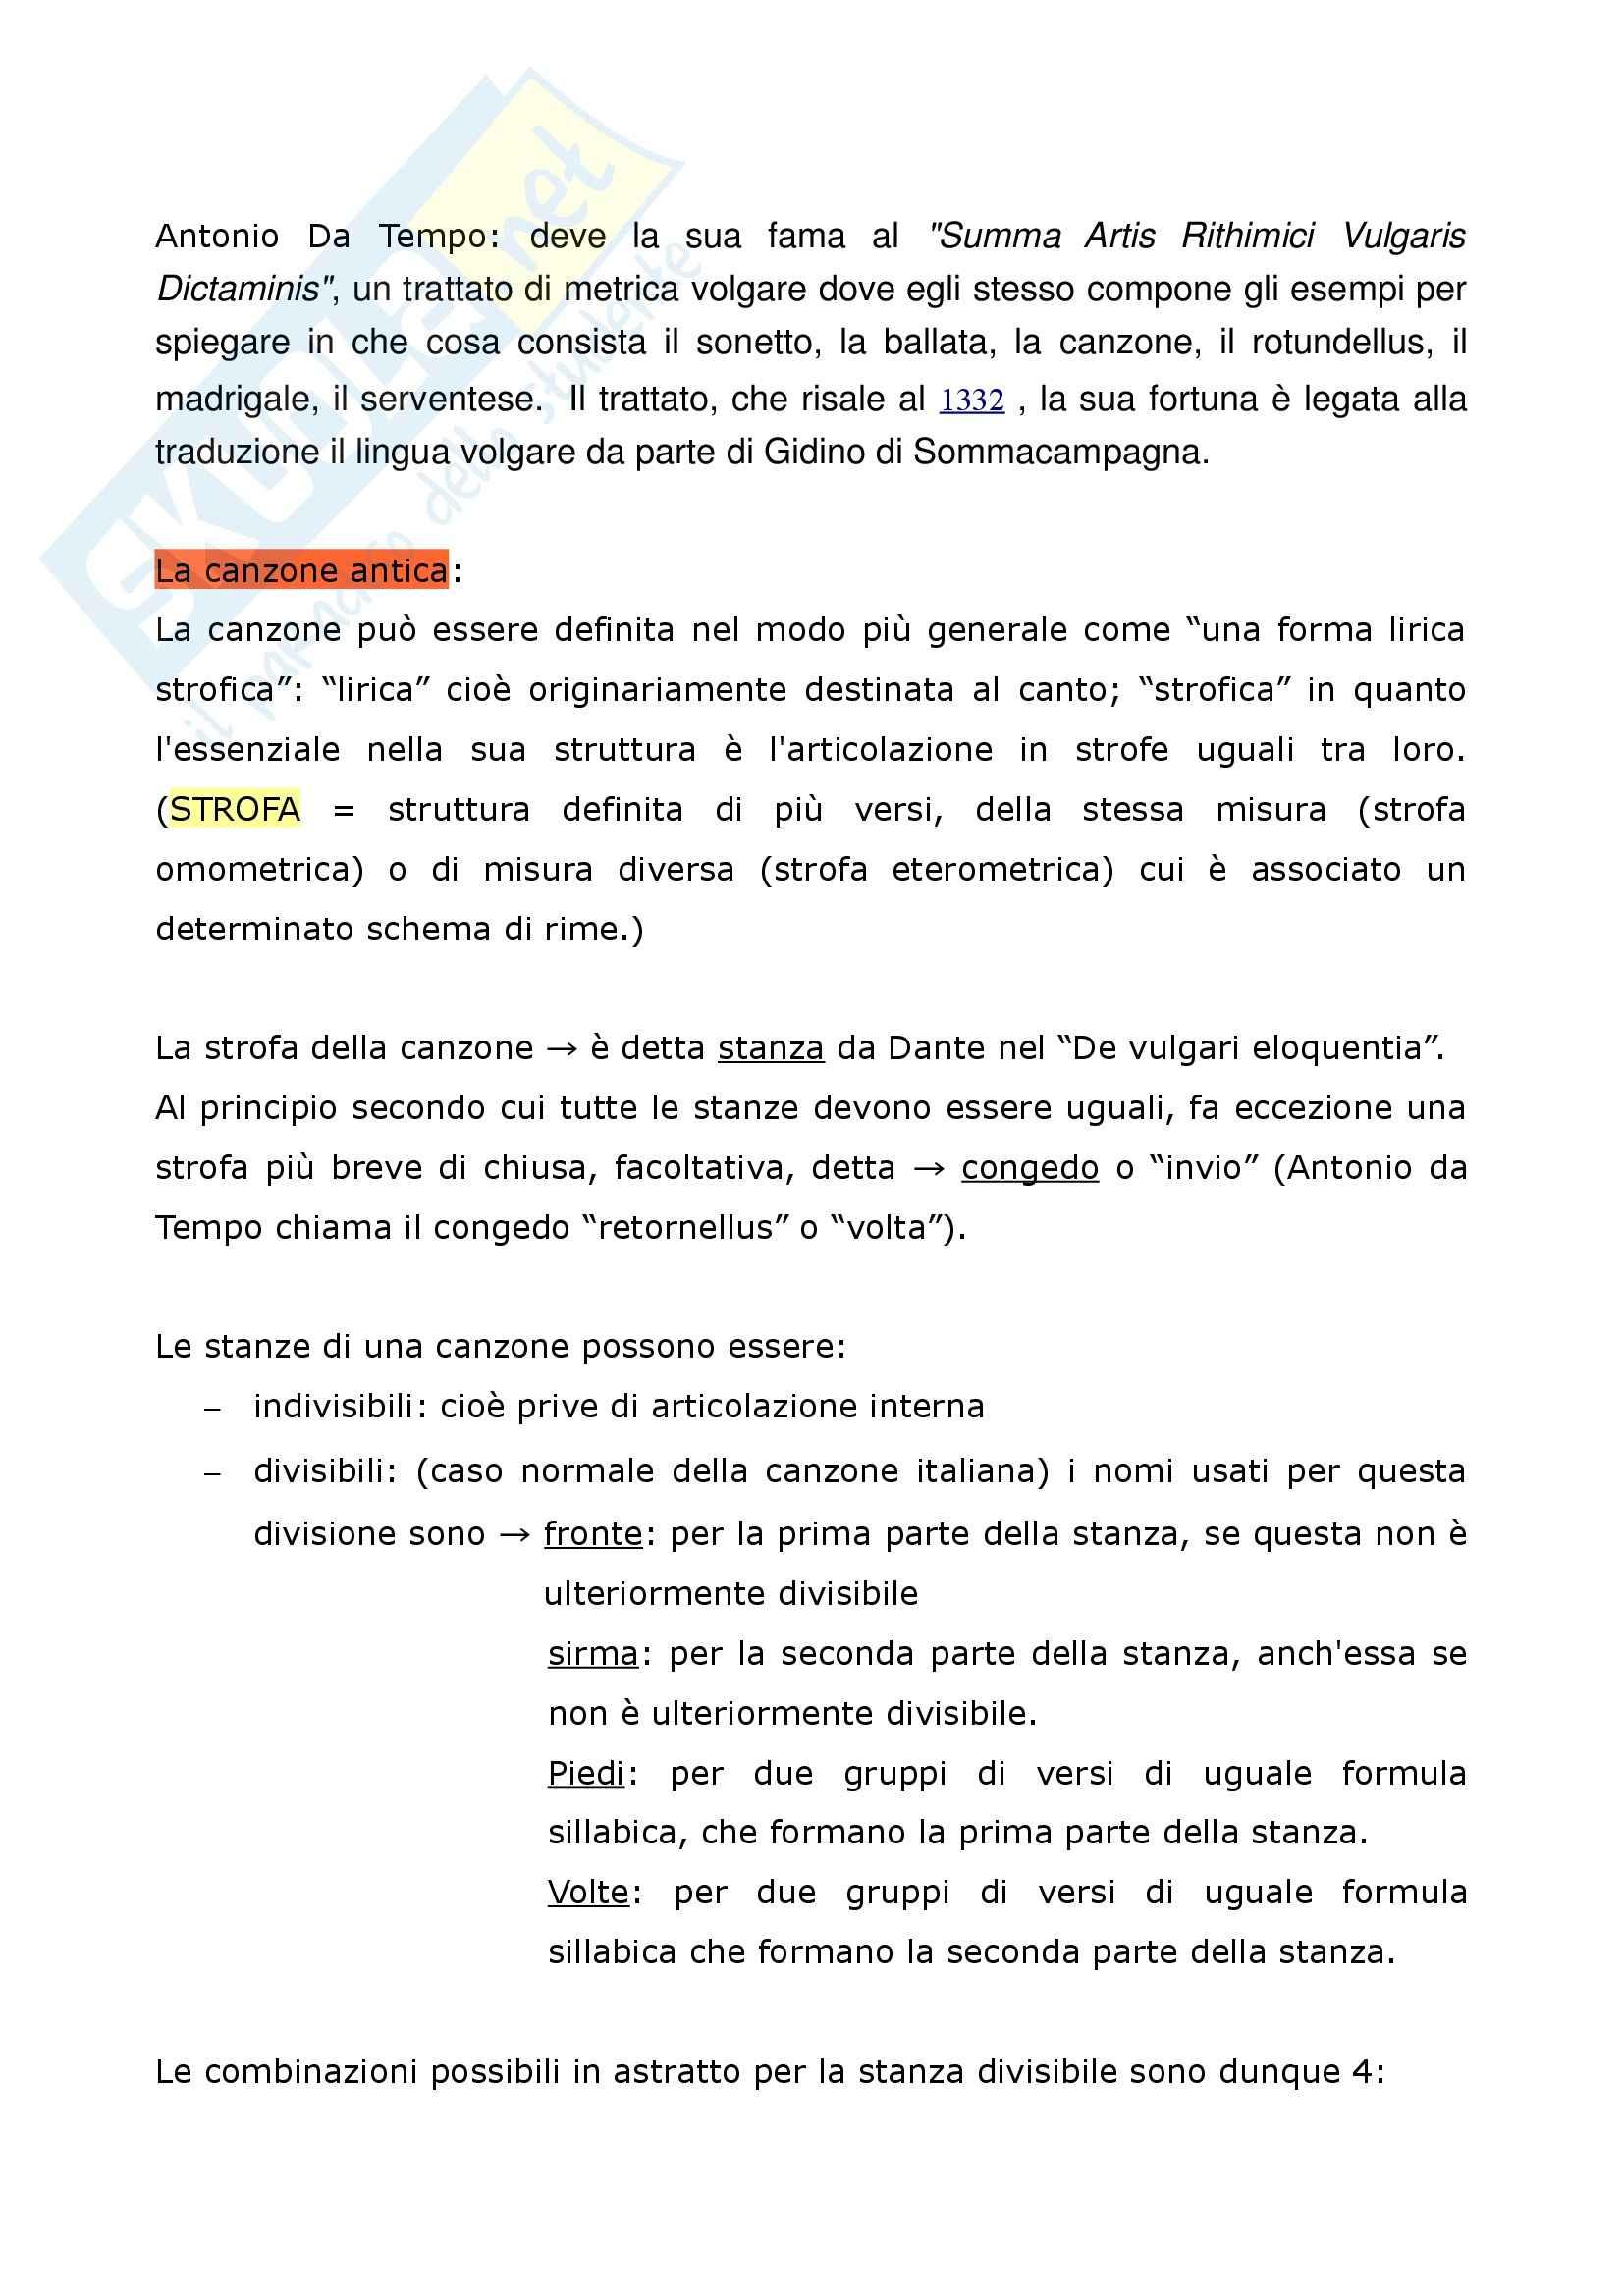 Riassunto esame Filologia italiana, La Metrica italiana, Beltrami, prof. Pancheri Pag. 11